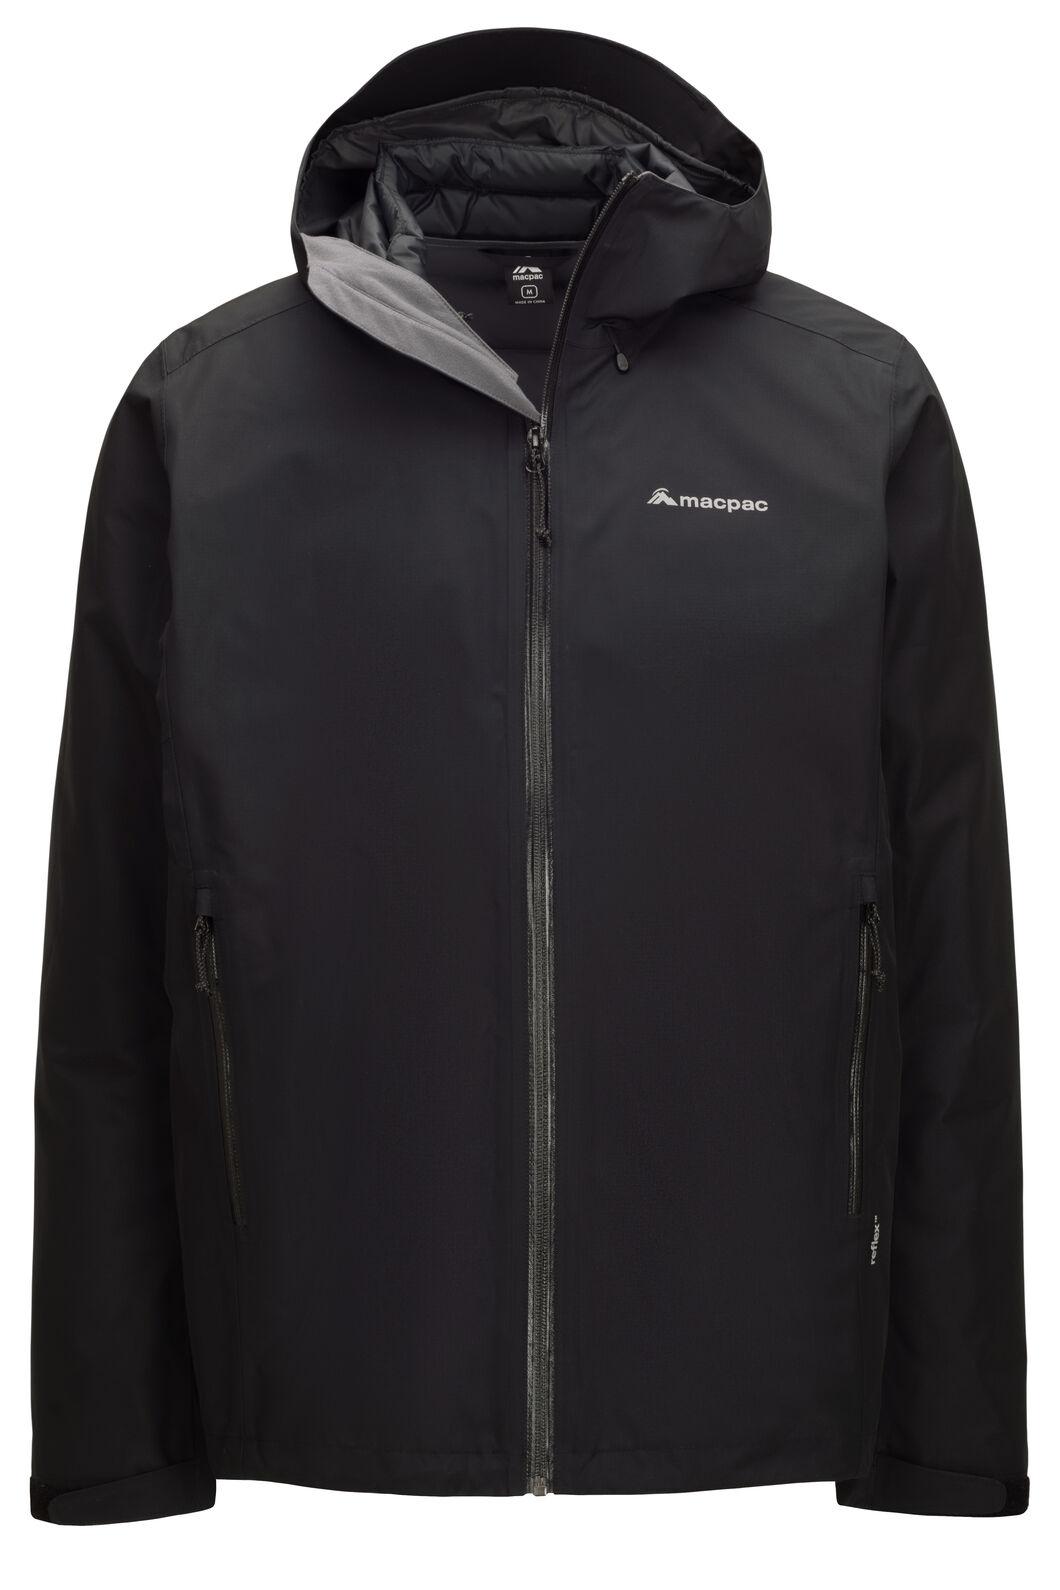 Macpac Men's Névé Three-In-One Reflex™ Jacket, Black, hi-res